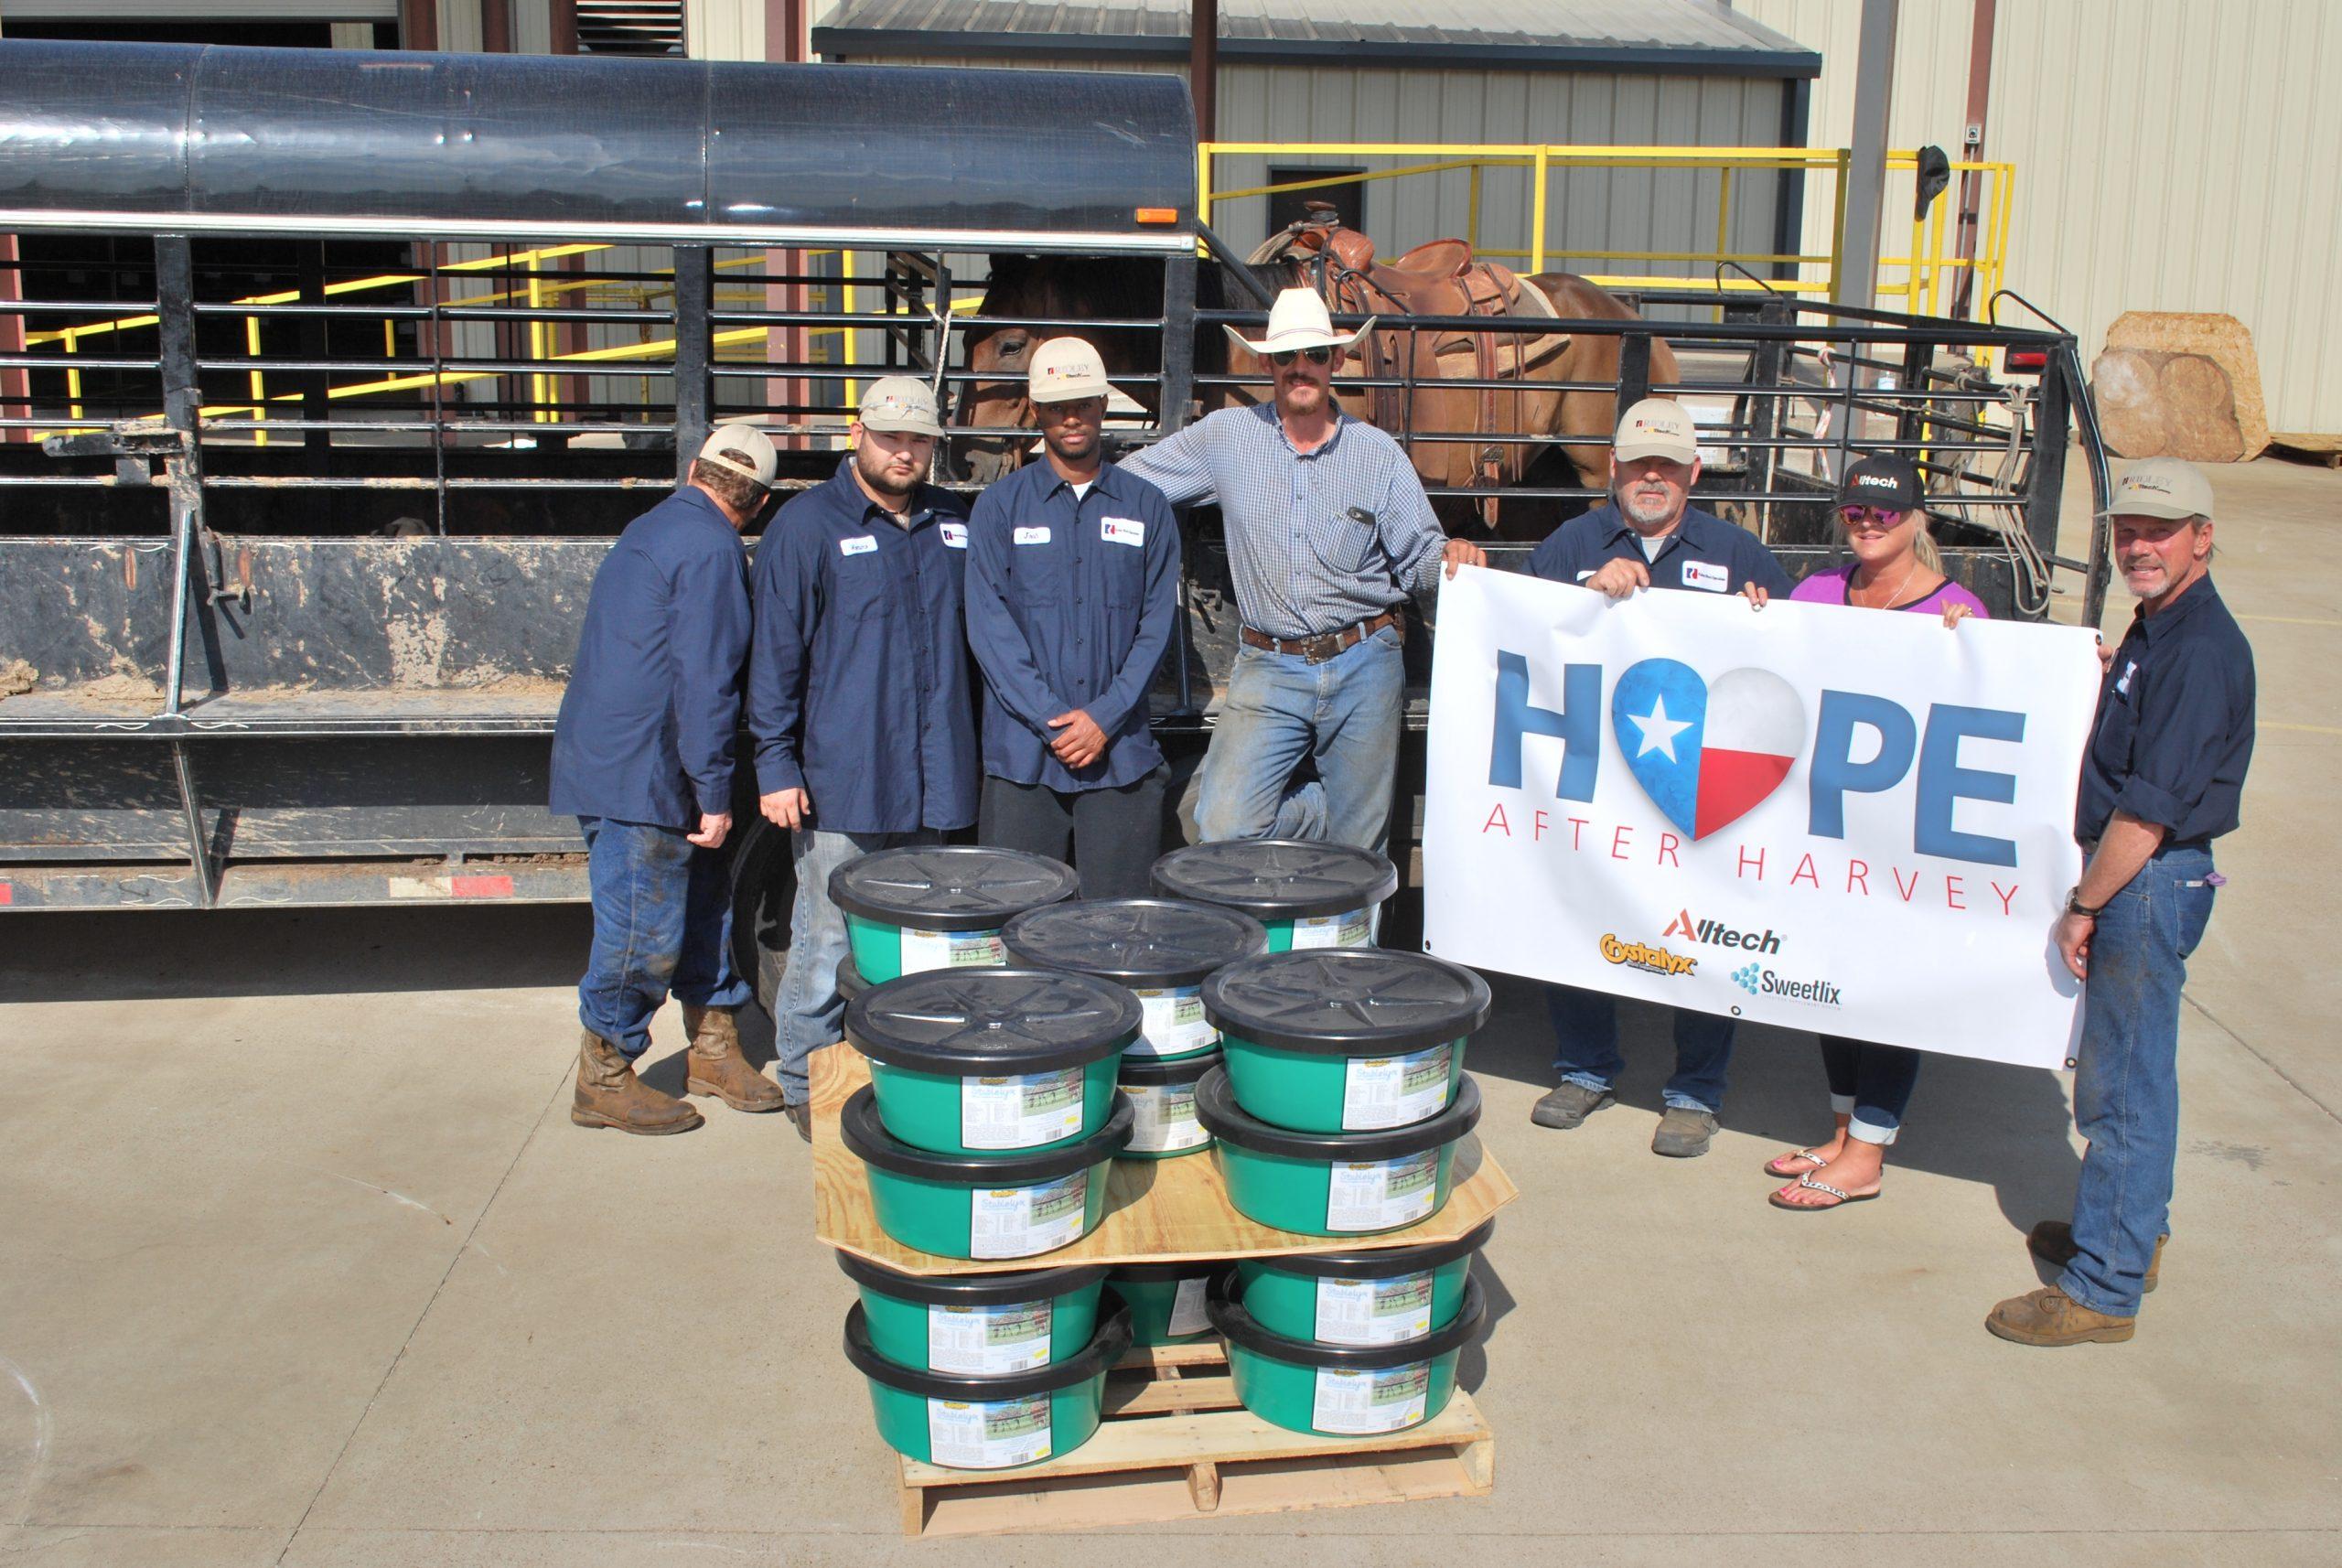 Hope After Harvey effort team from Alltech